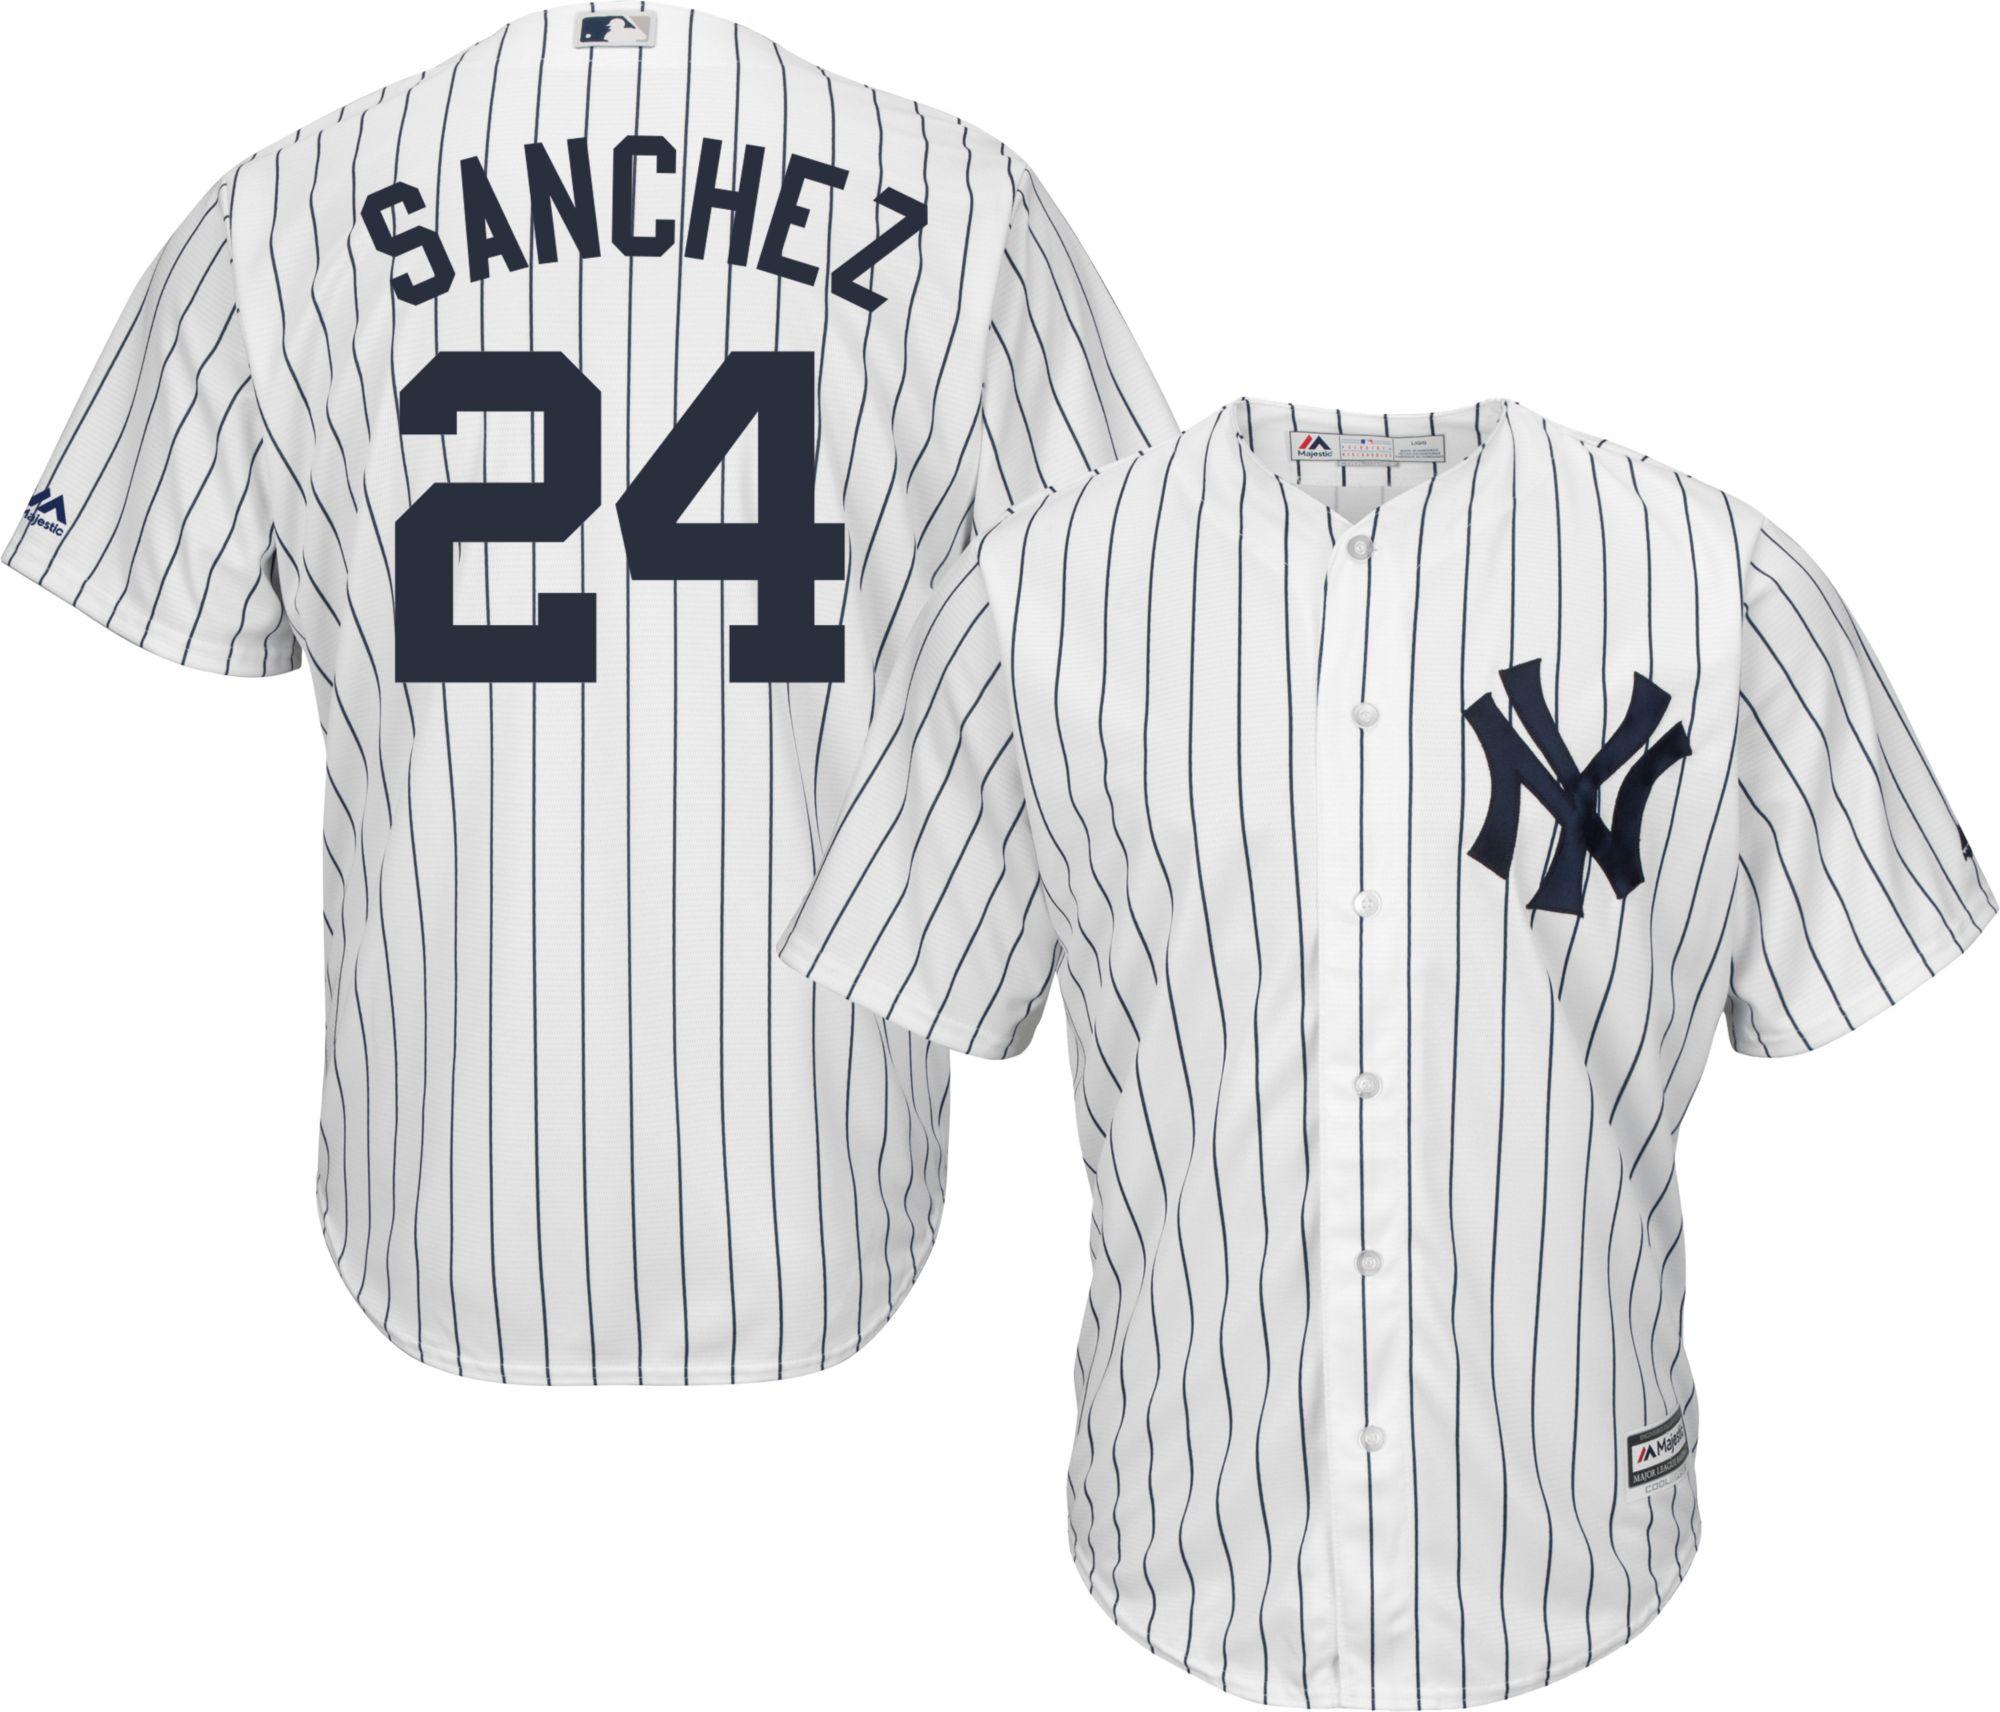 promo code 38ca0 11a2c yankees 24 jersey